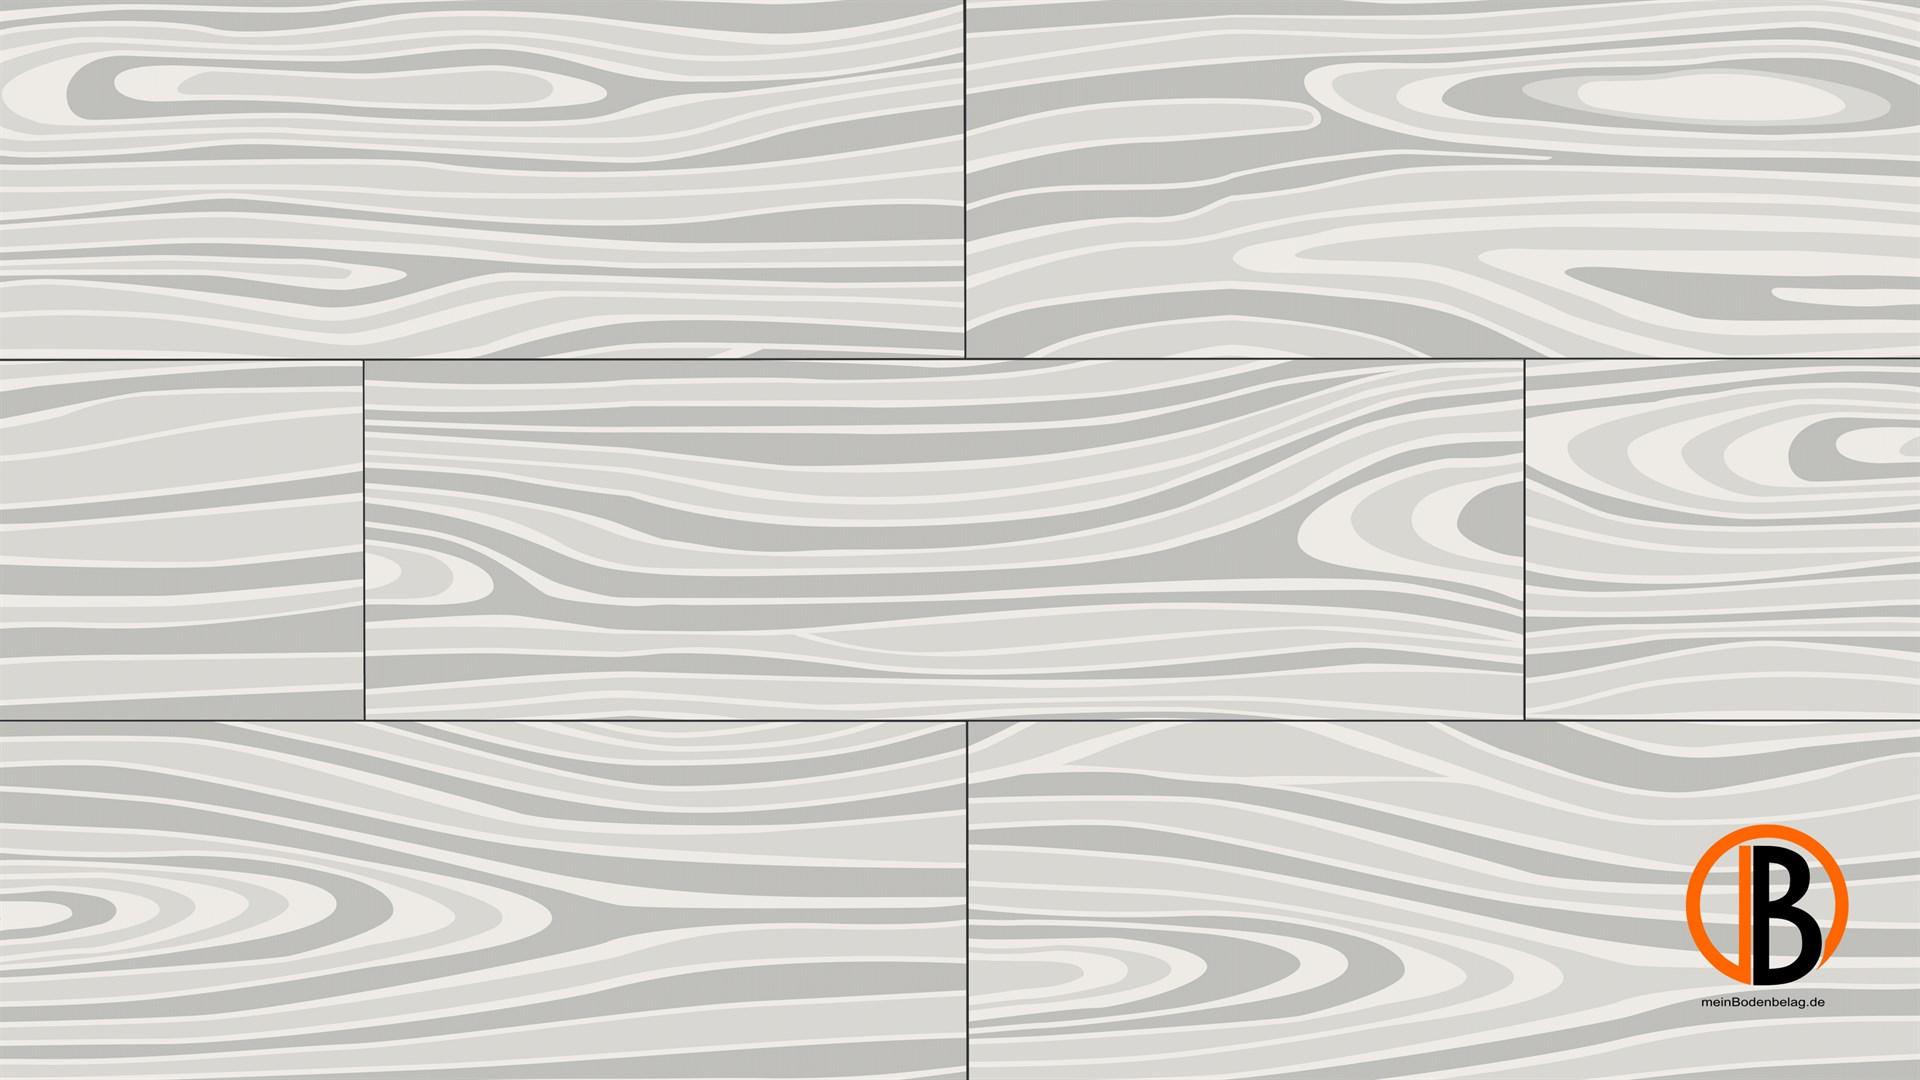 parador laminat edition 1 matteo thun wood memory 1 minifase. Black Bedroom Furniture Sets. Home Design Ideas